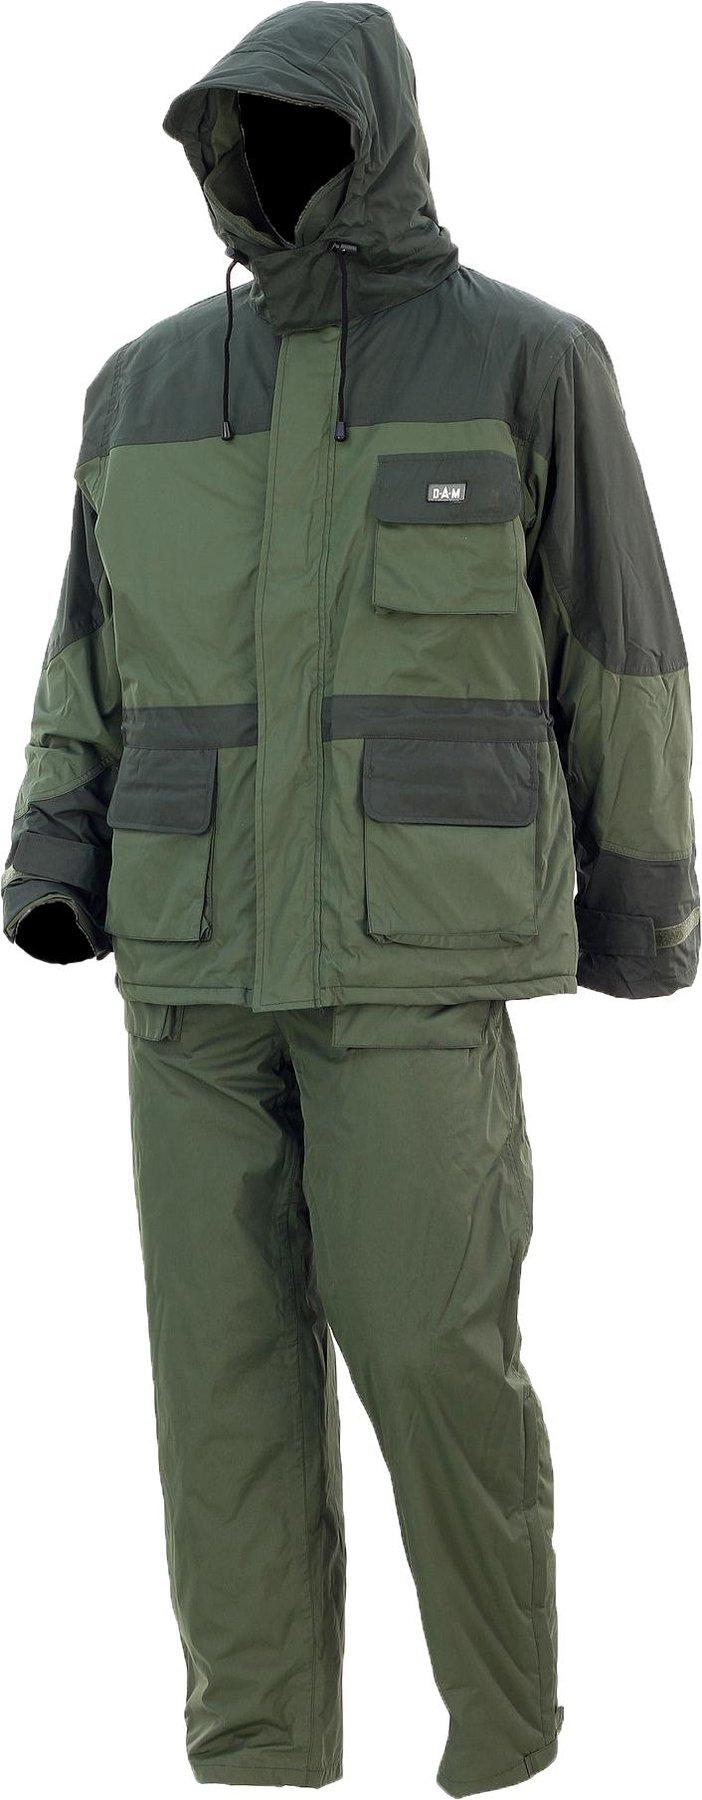 Angel Berger Magic Baits Thermoanzug Winter Suit 2 teilig